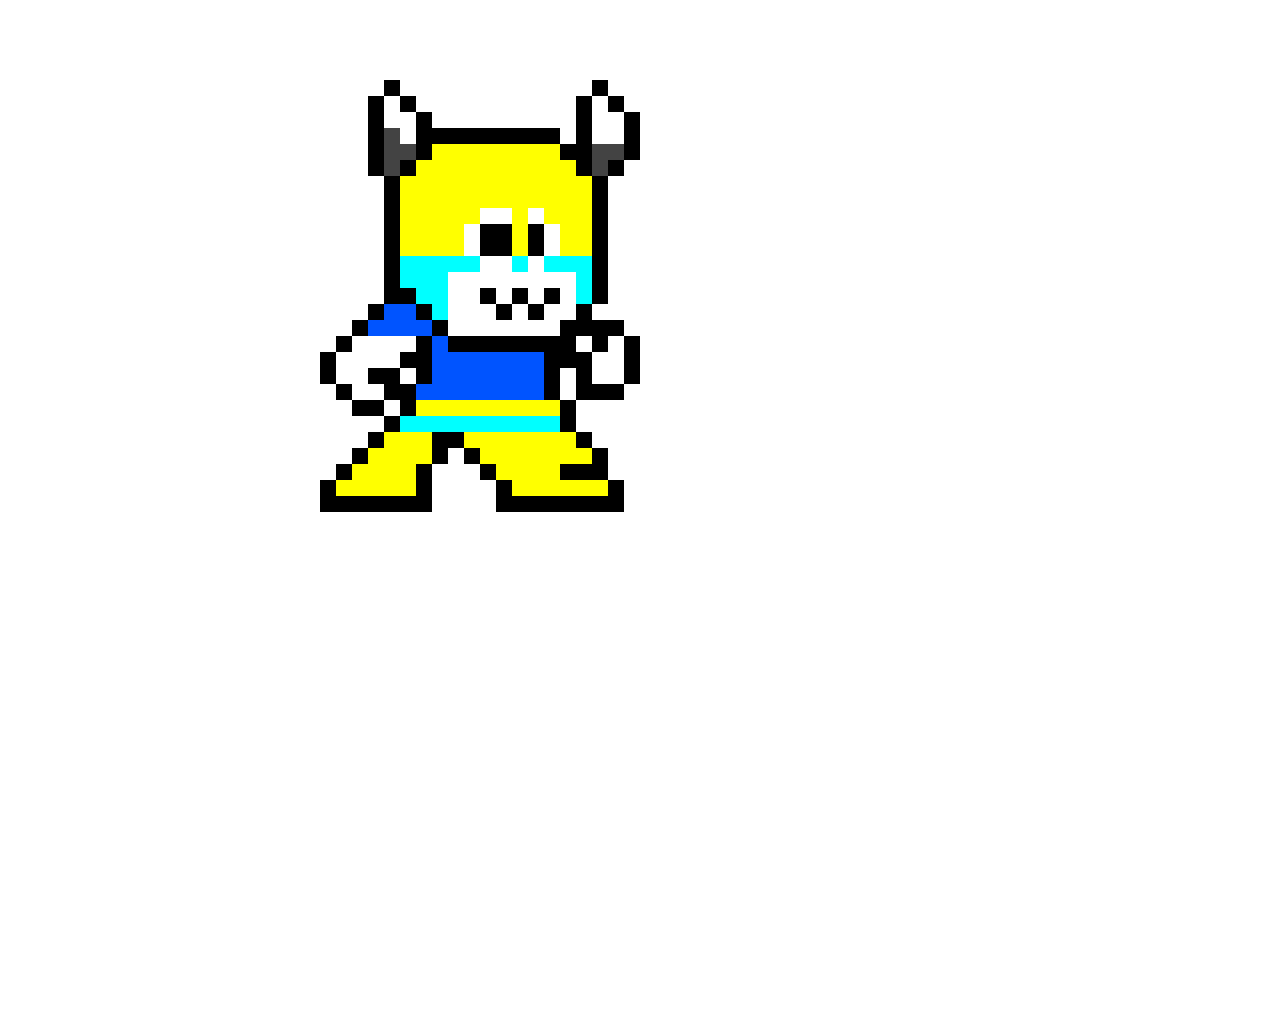 I made @temcareforeg in a Mega Man style